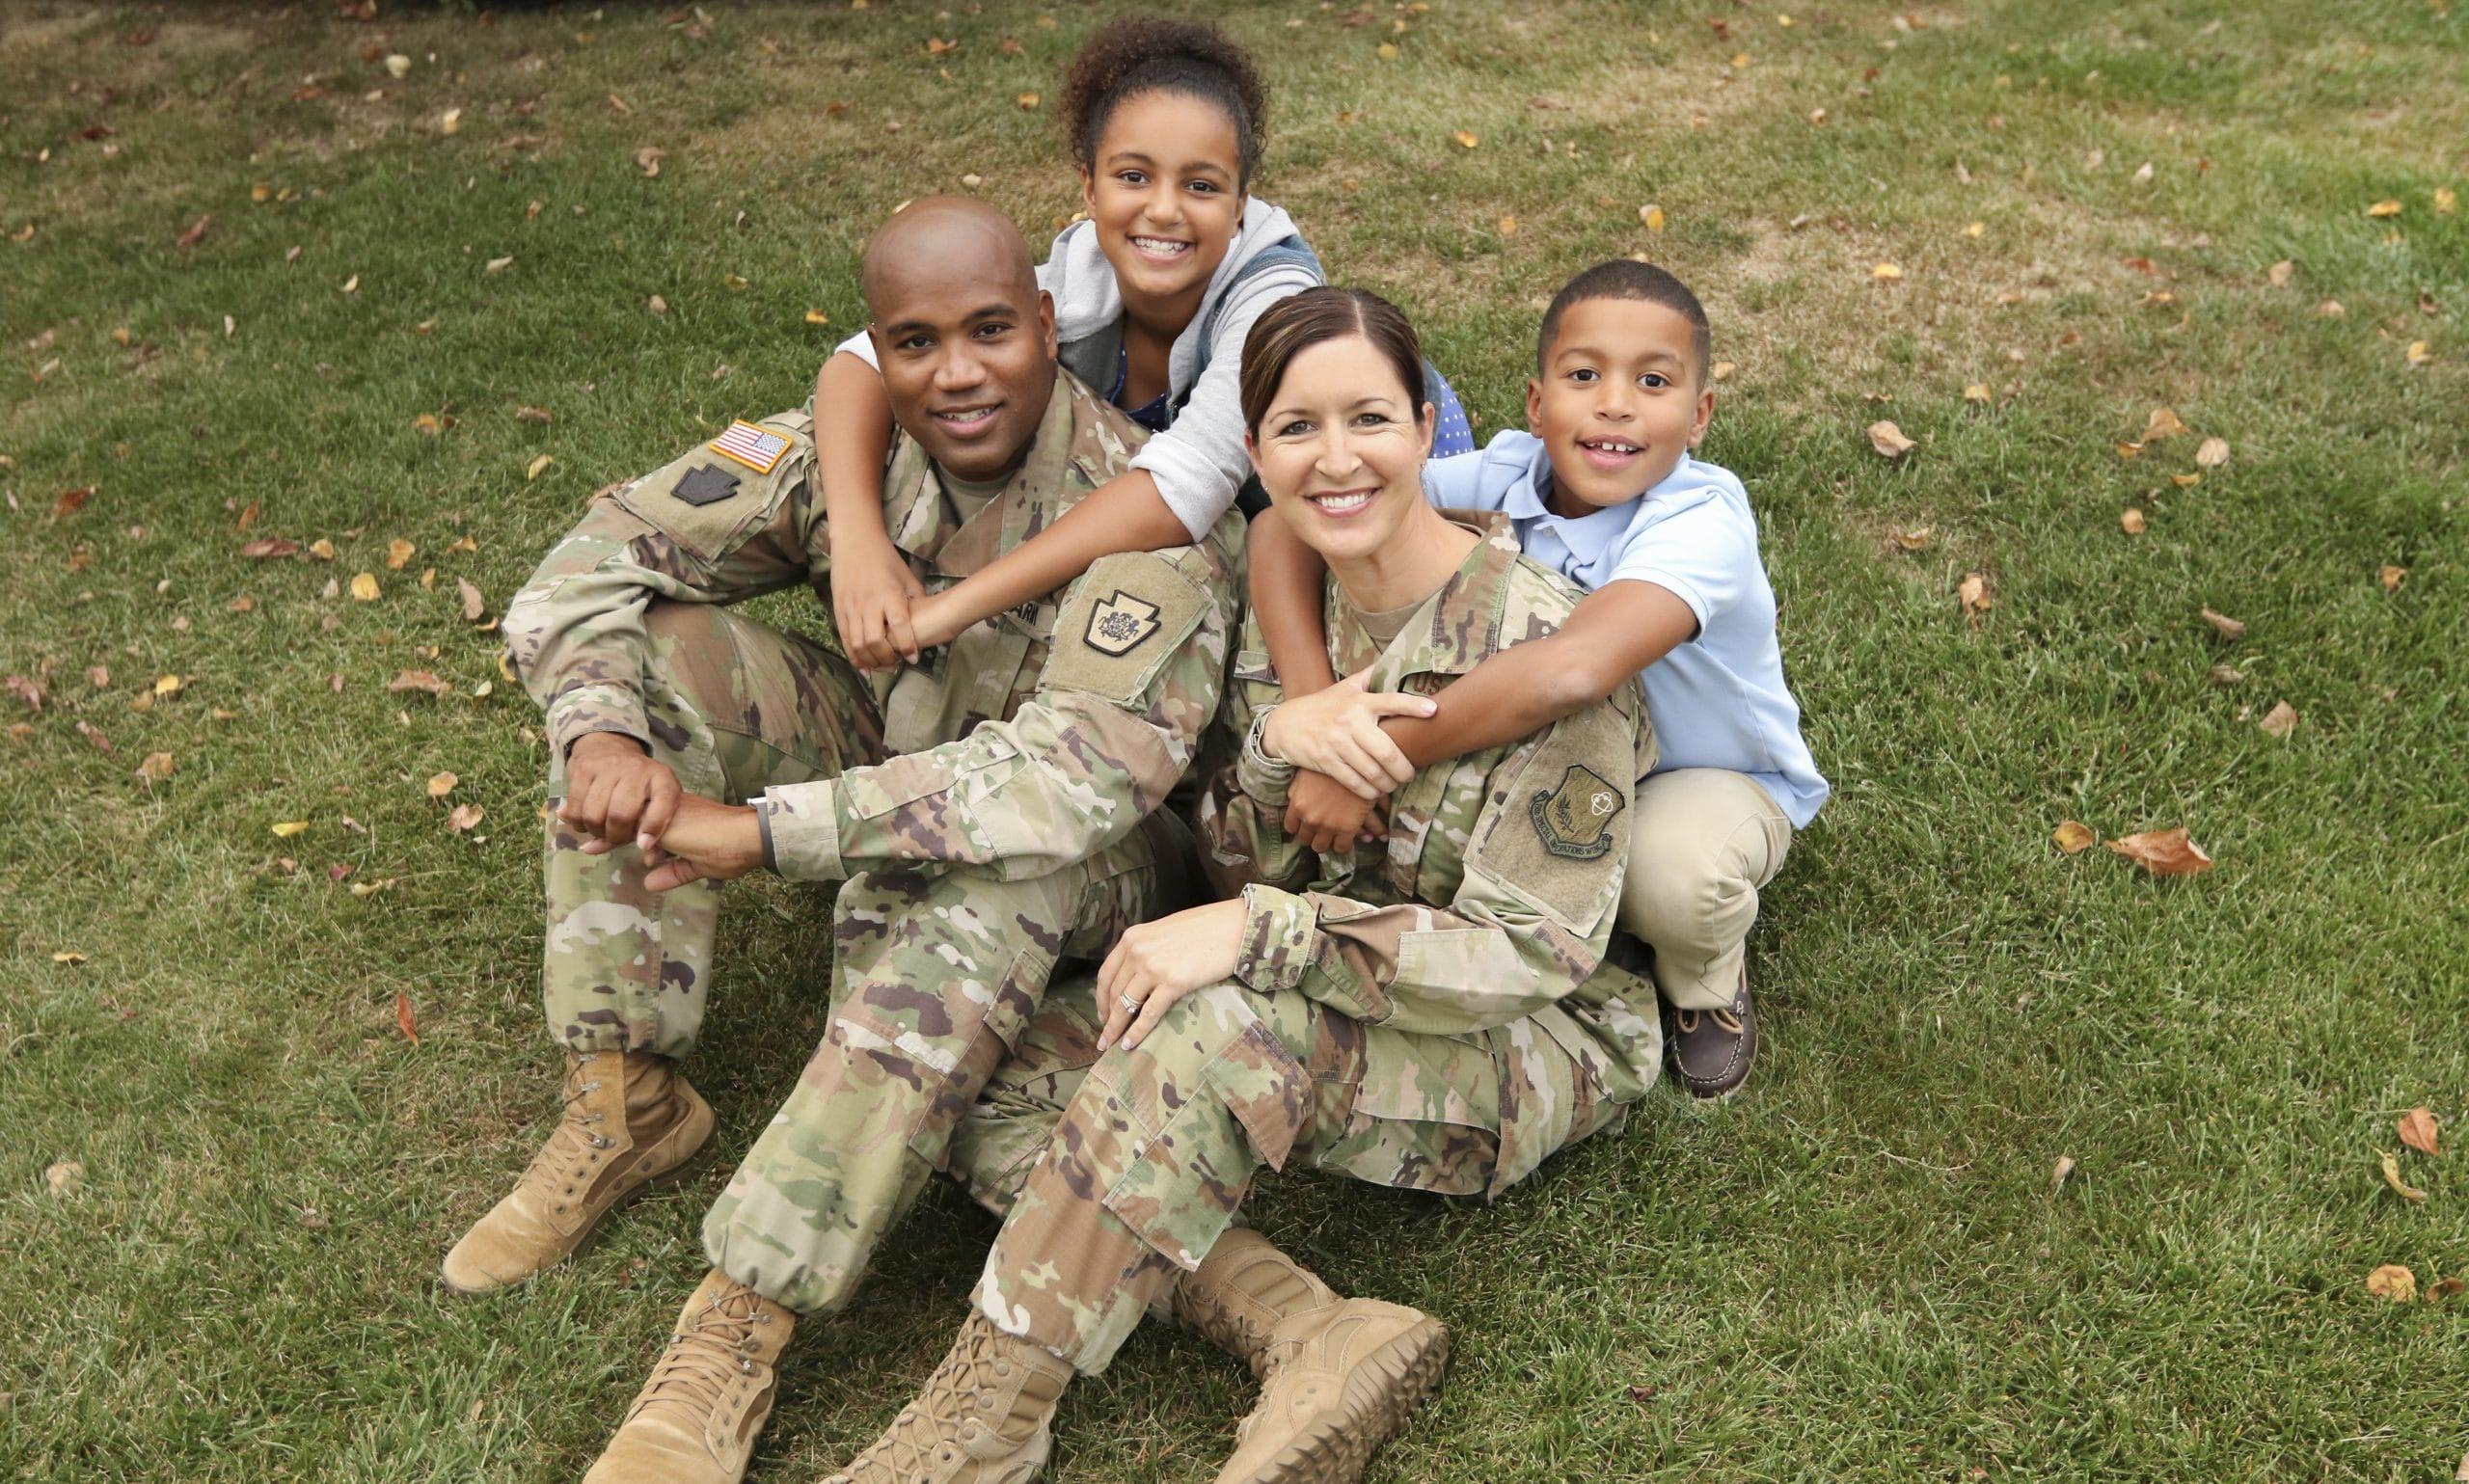 5 VA Loan Benefits for DFW Area Home Buyers